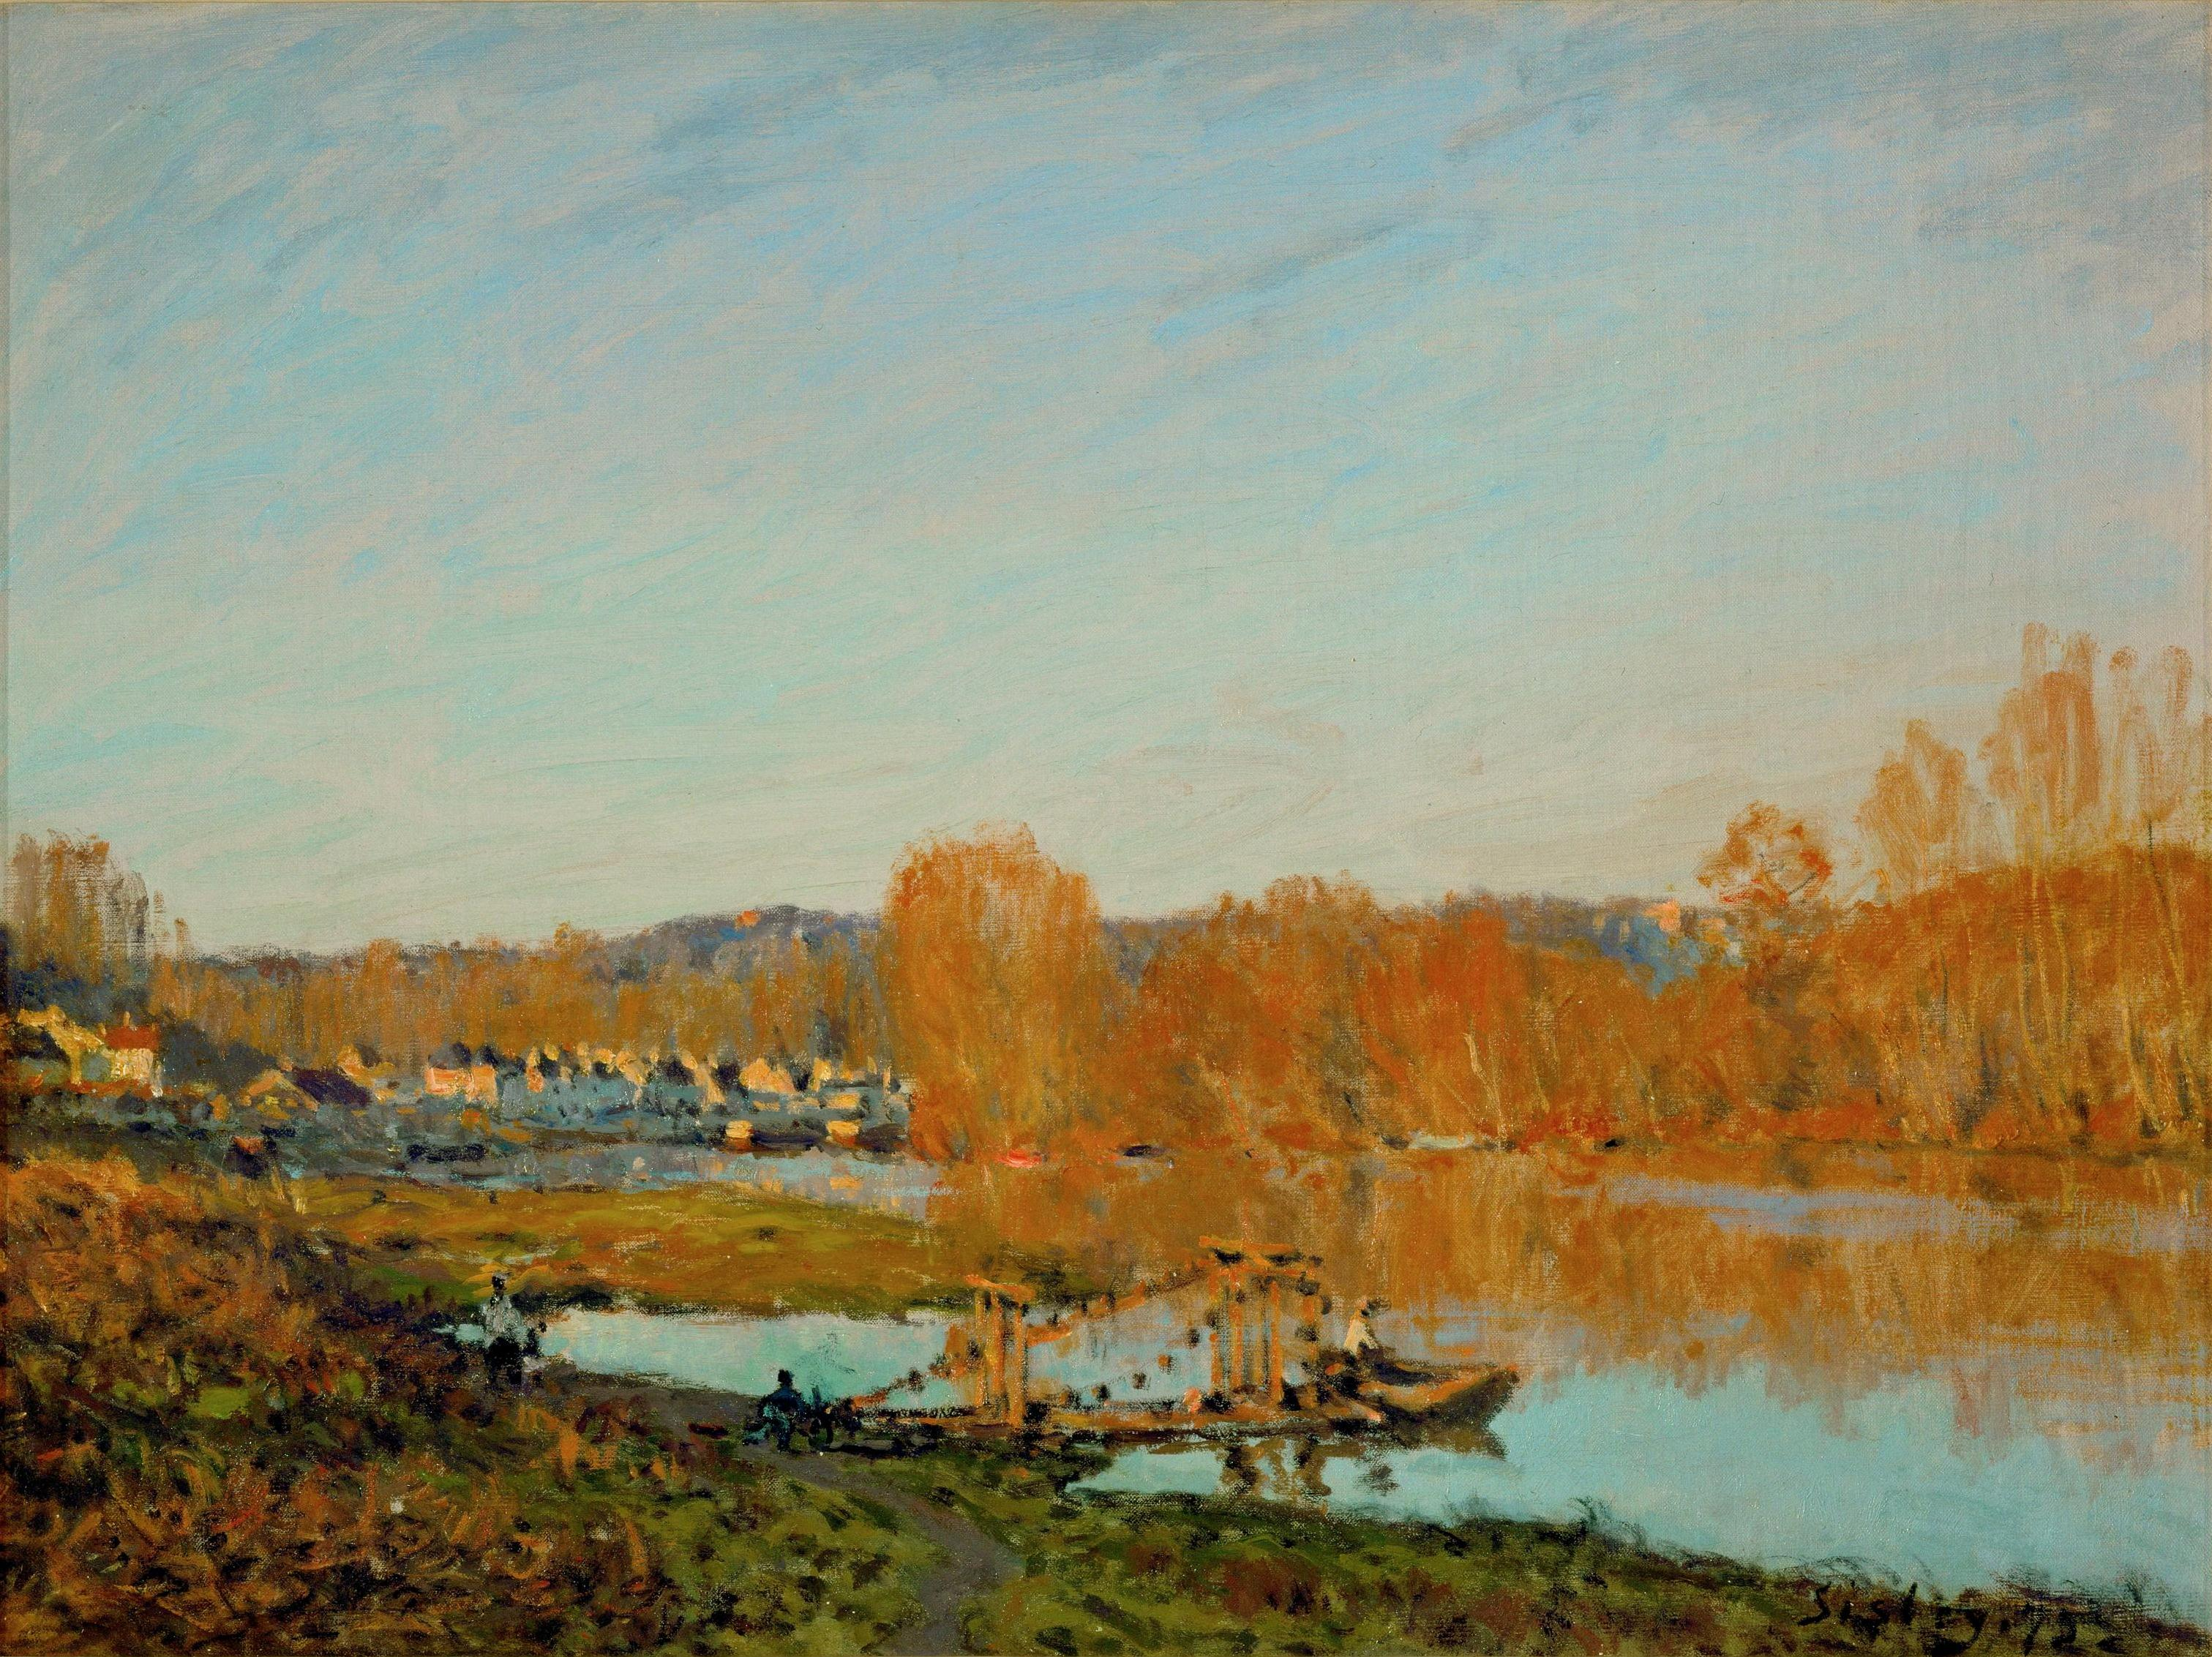 Alfred Sisley, (1839 - 1899) Alfred_Sisley,_L%27automne_-_Bords_de_la_Seine_pres_Bougival_%28Autumn_-_Banks_of_the_Seine_near_Bougival%29,_1873